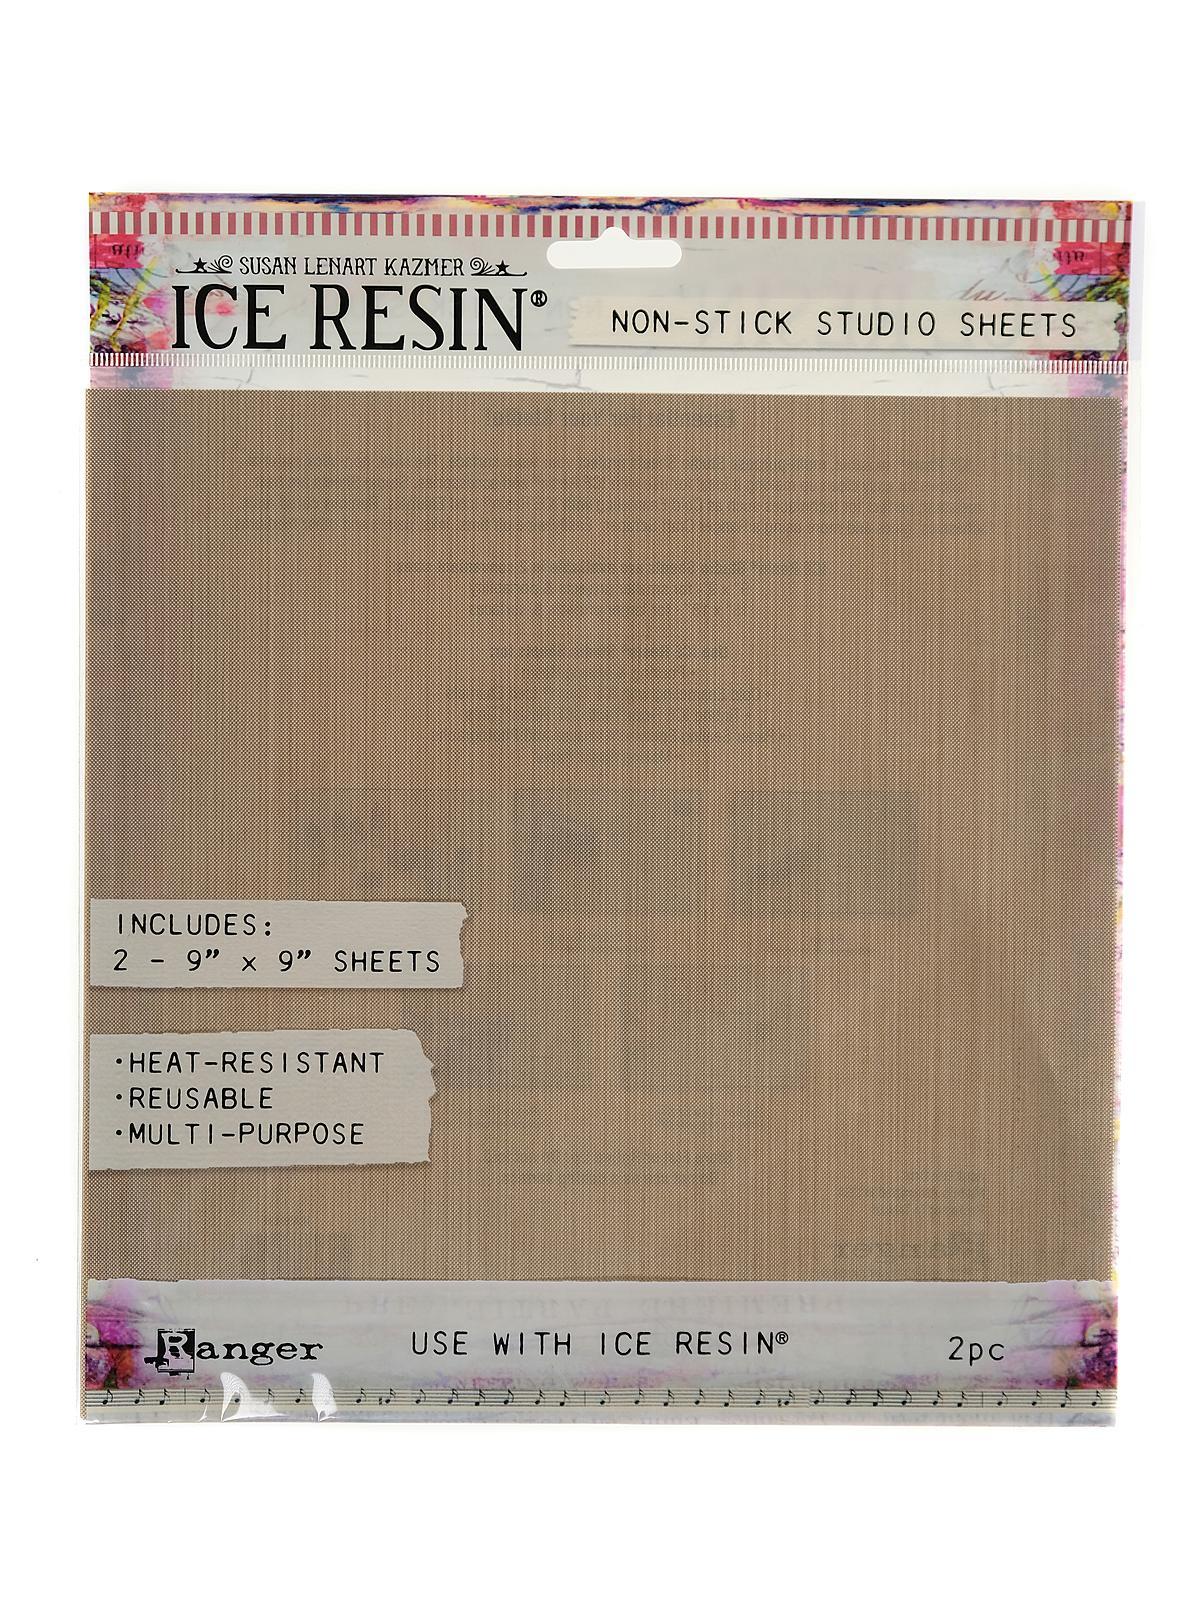 ICE Resin Studio Sheet